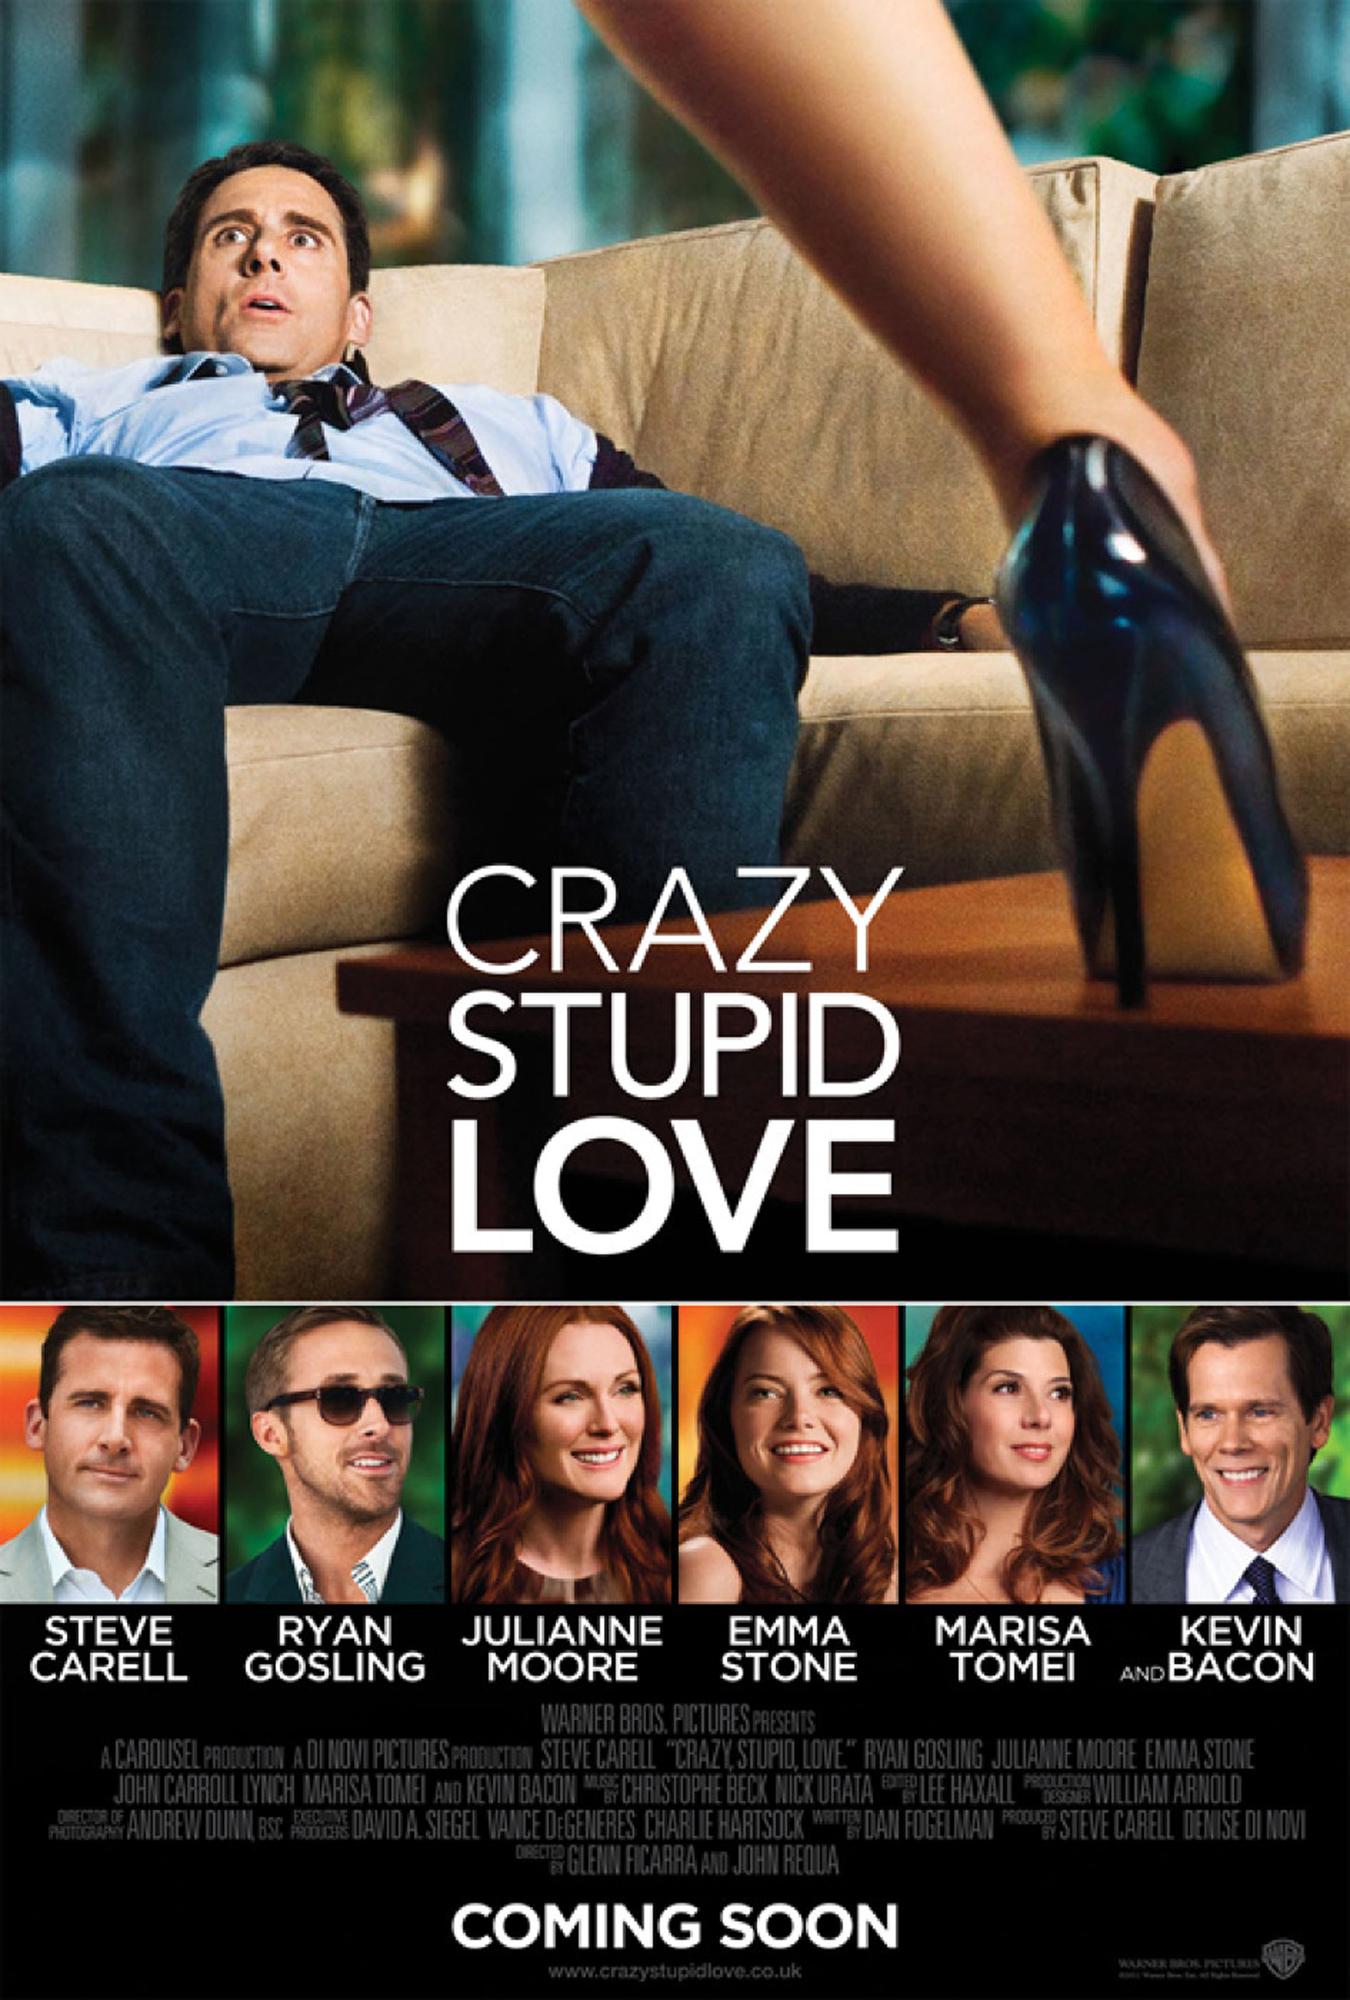 Cazy Stupid Love - 23 Sep 2011